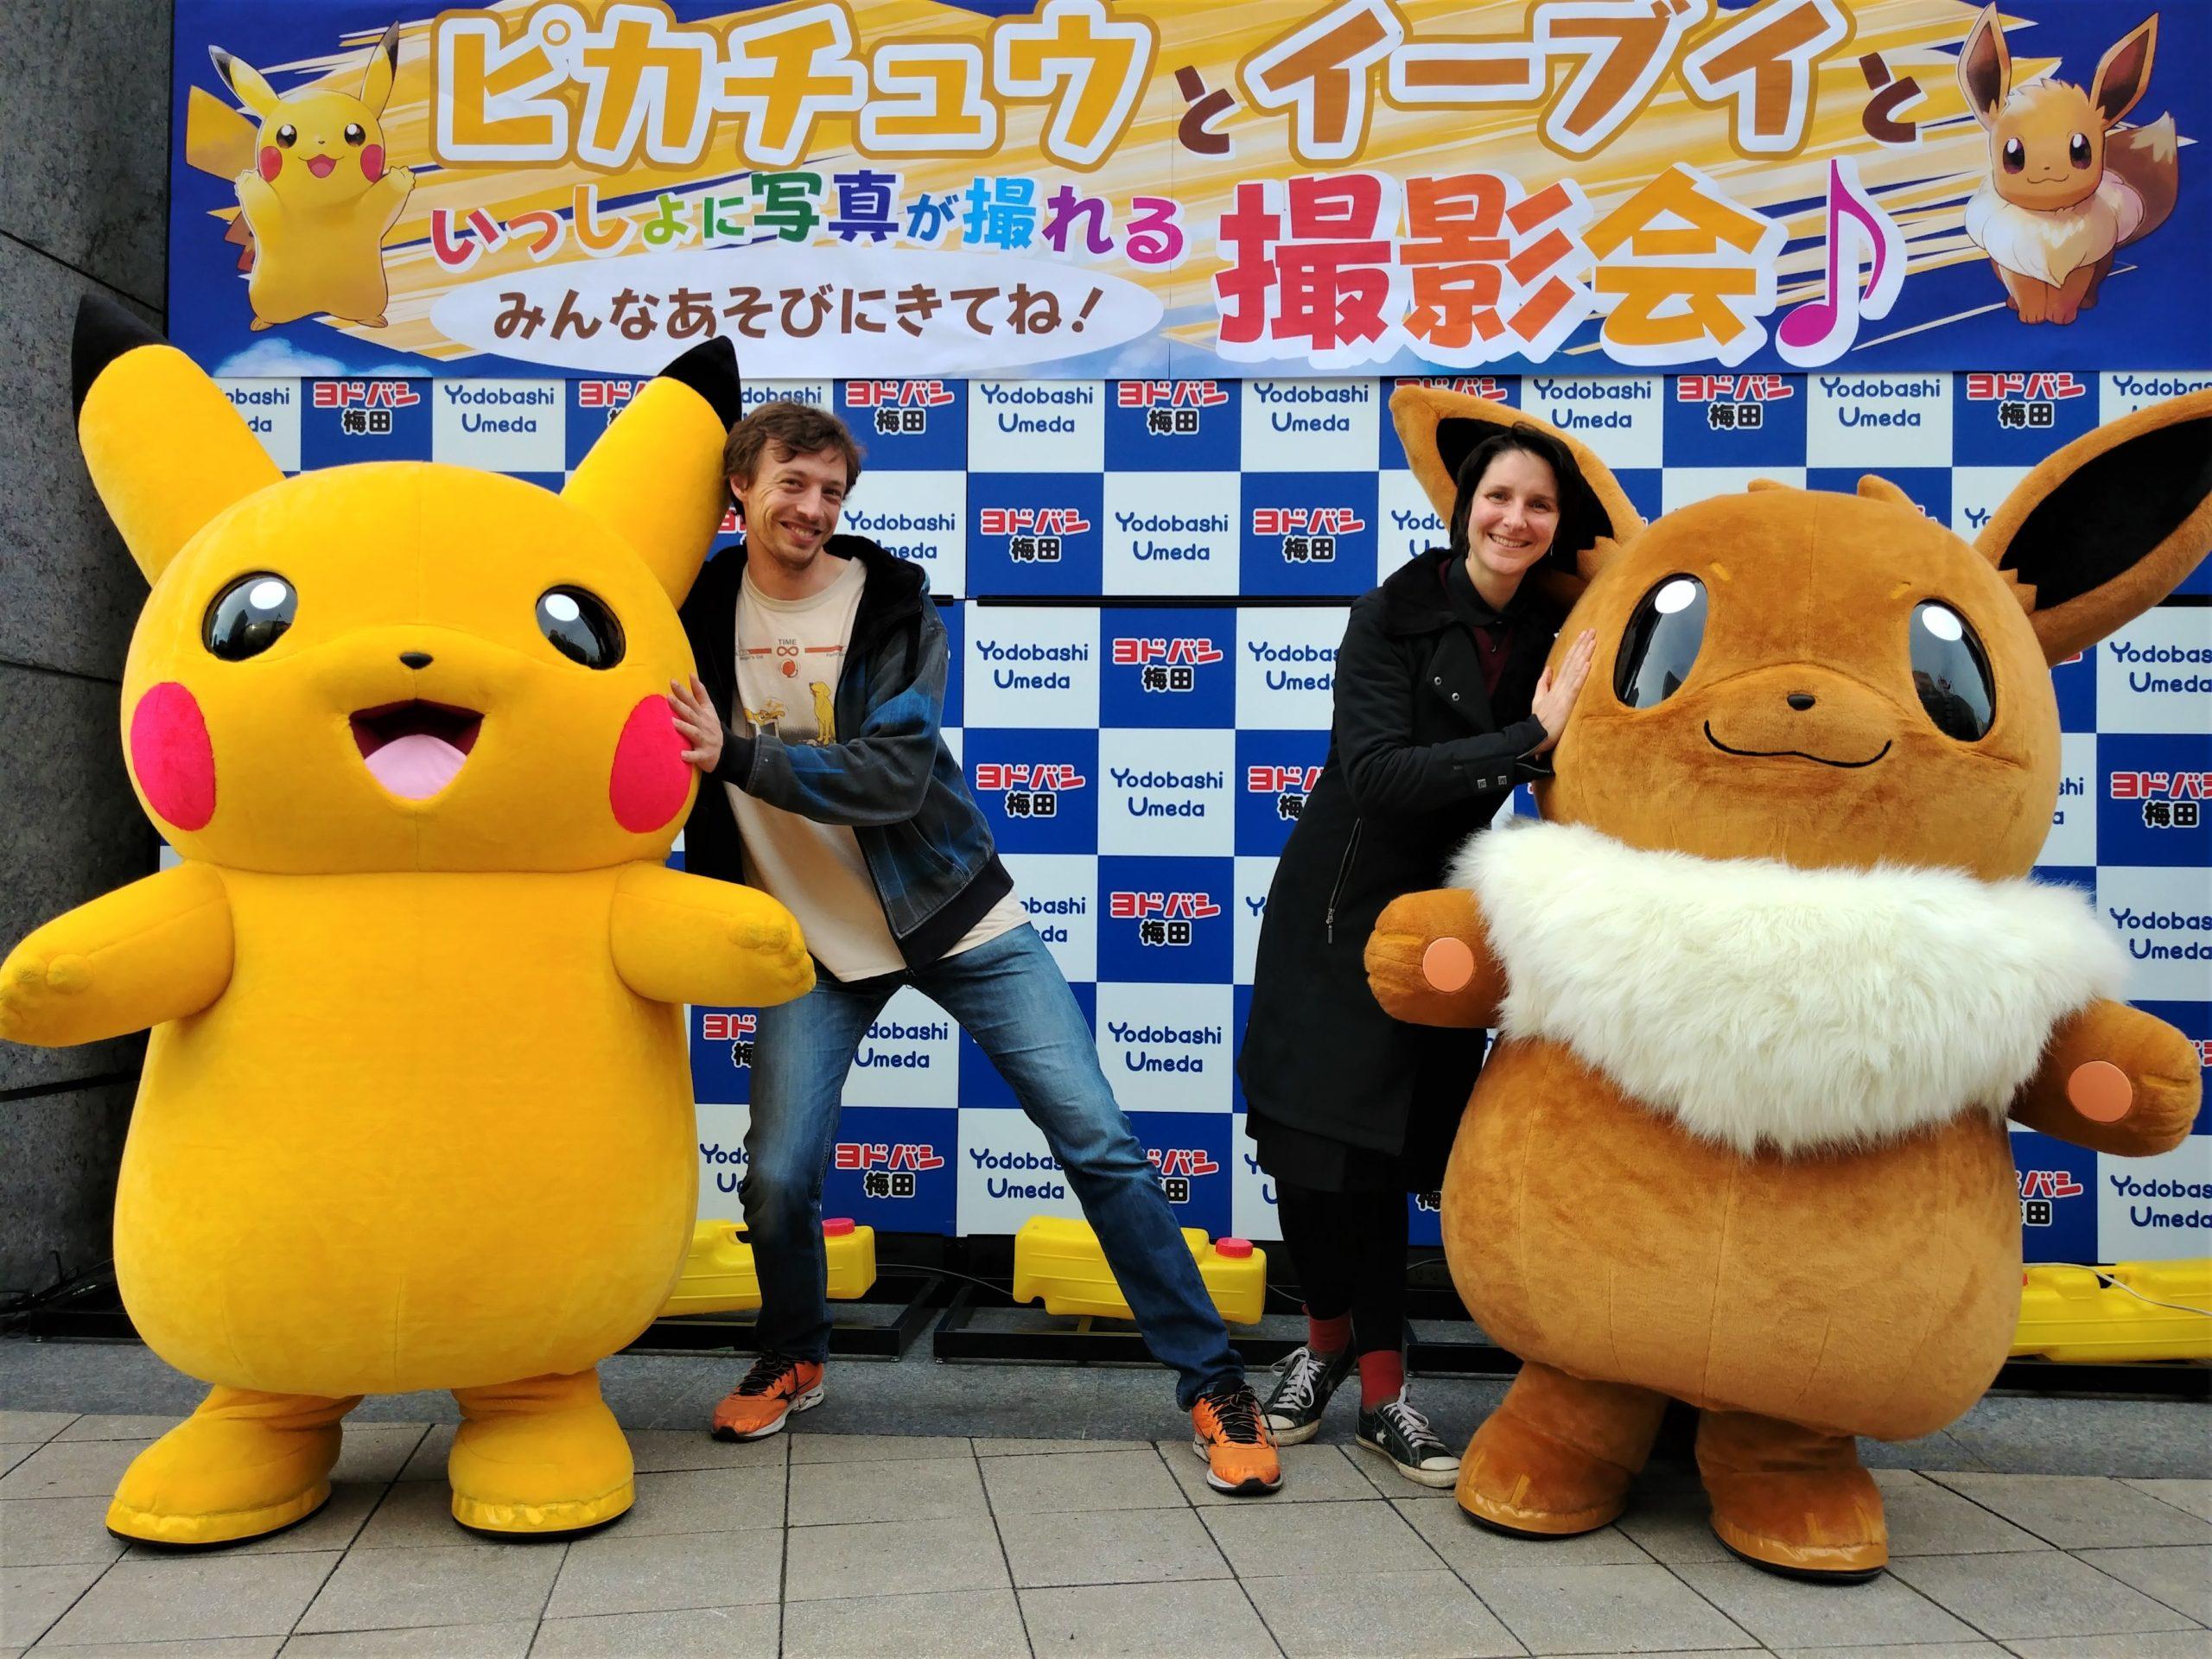 Osaka Kawaii den den town blog voyage Japon arpenter le chemin